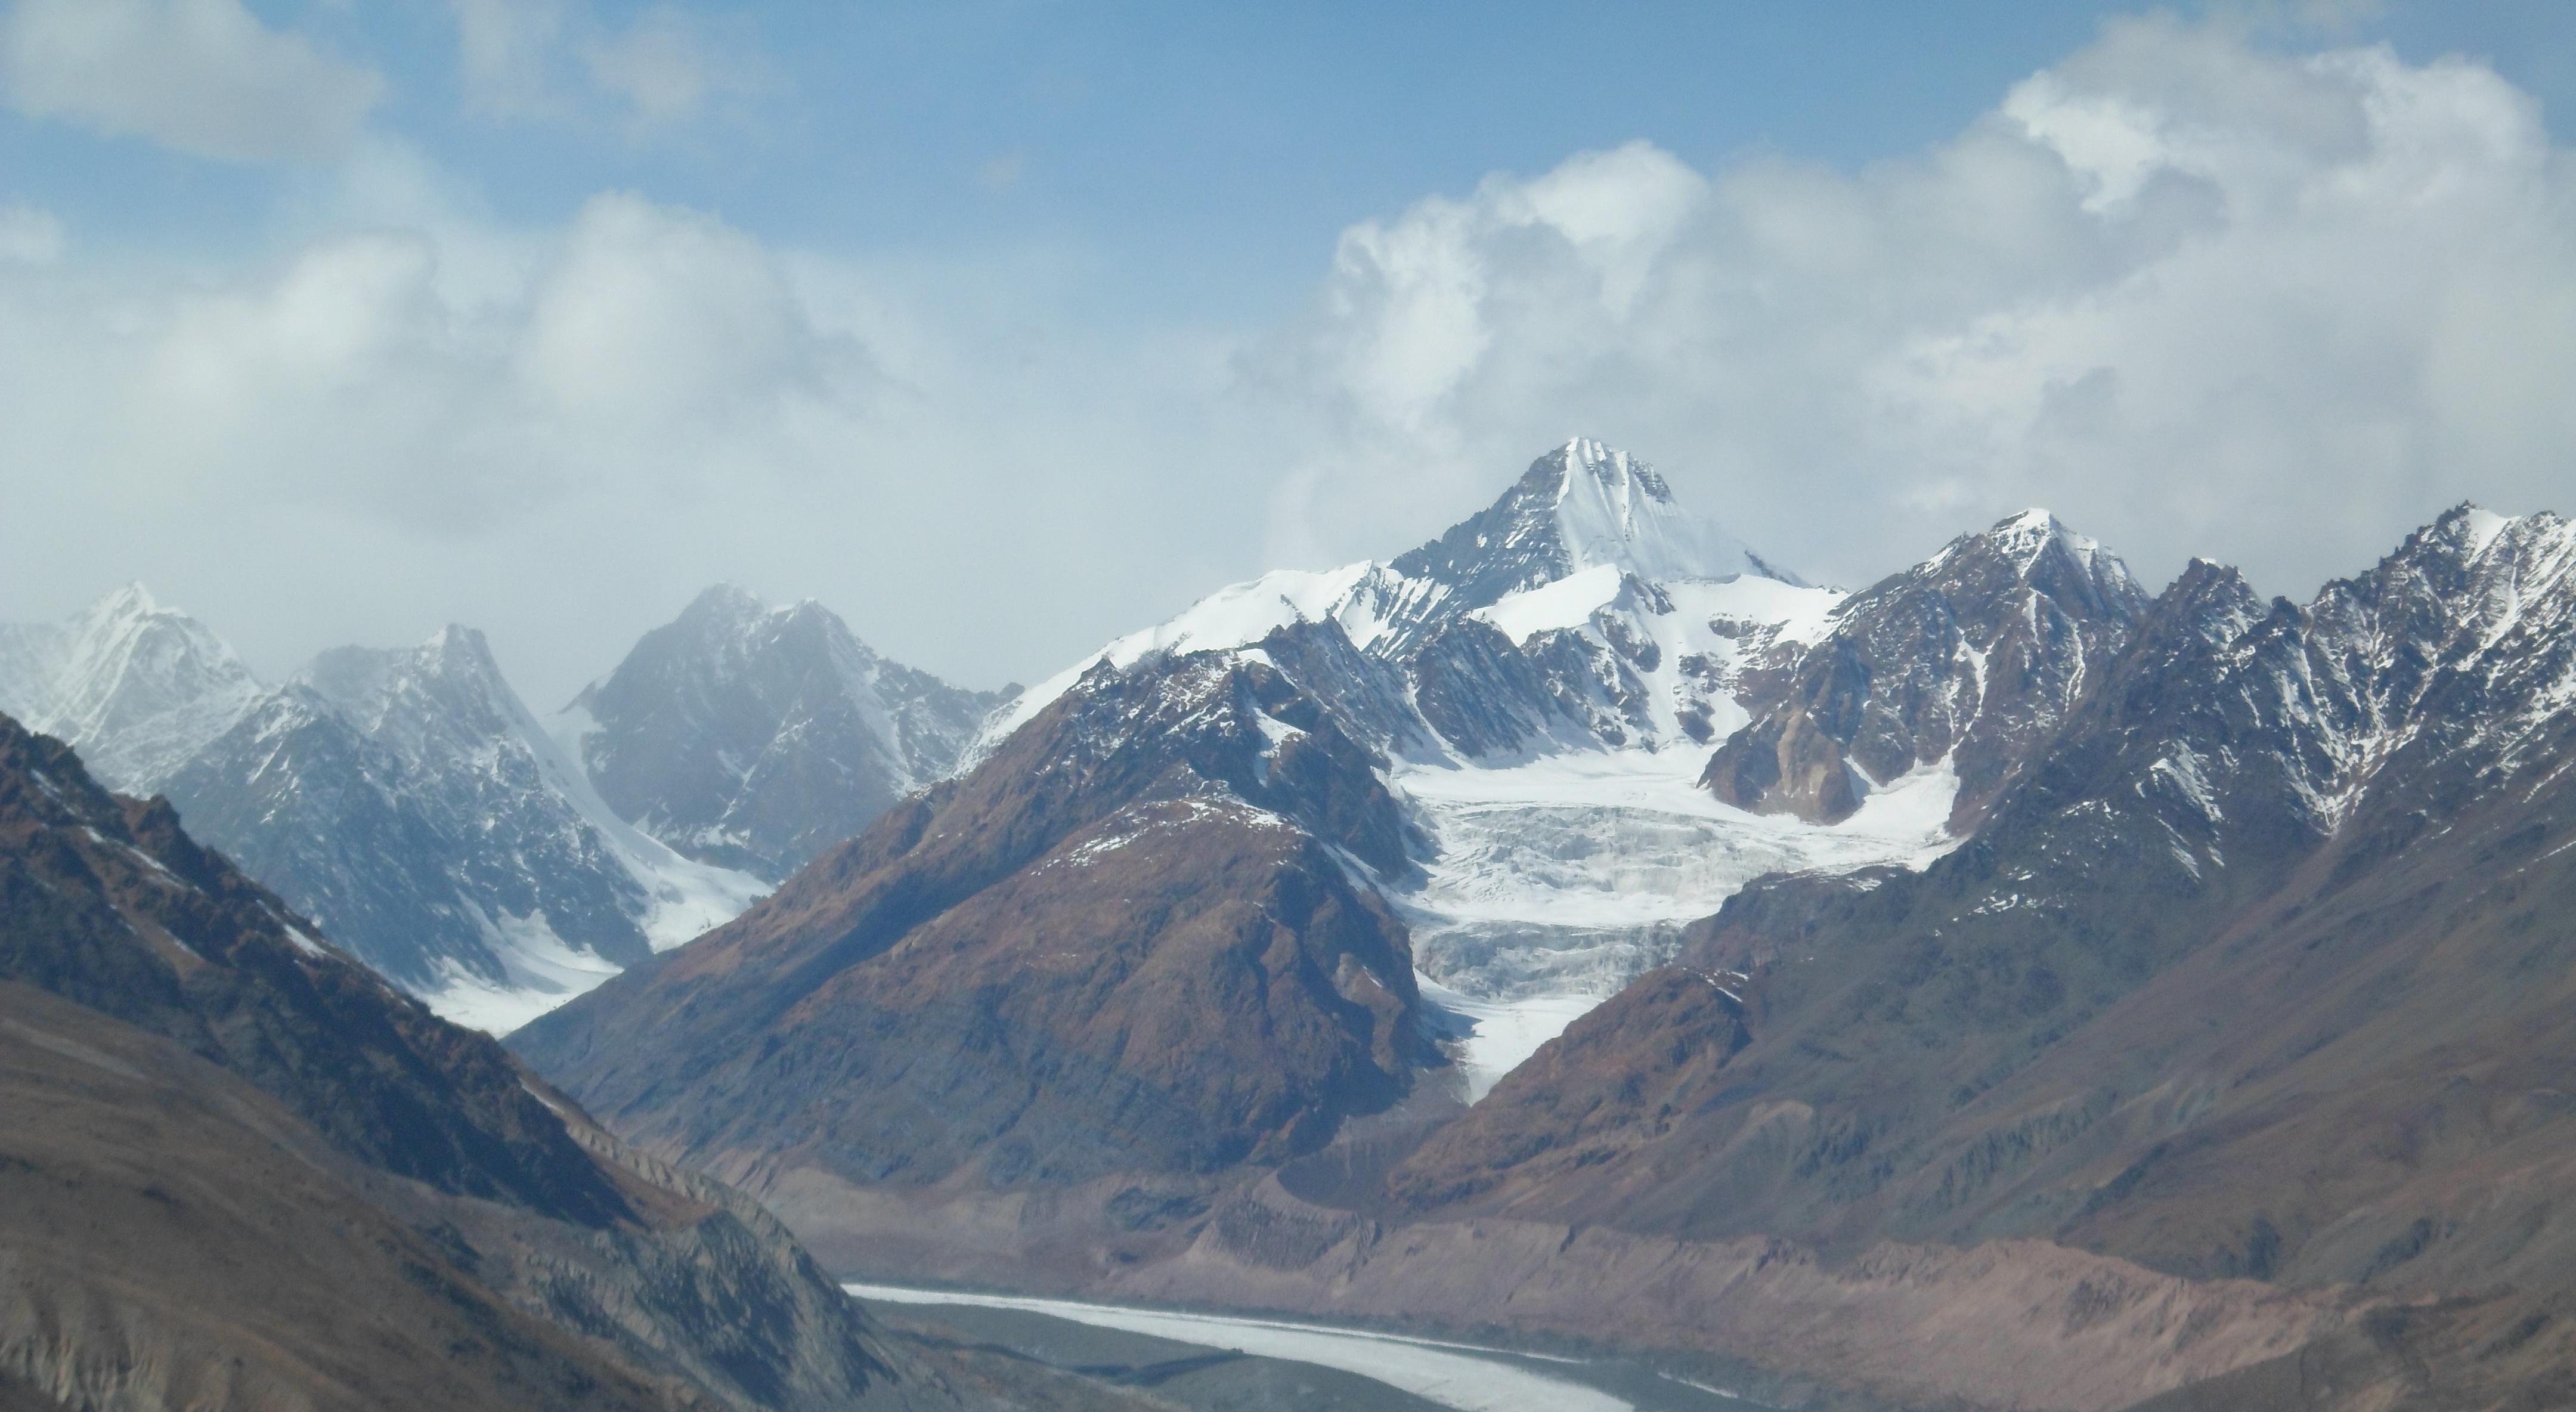 Snowy Peaks - KAZA, Himachal Pradesh